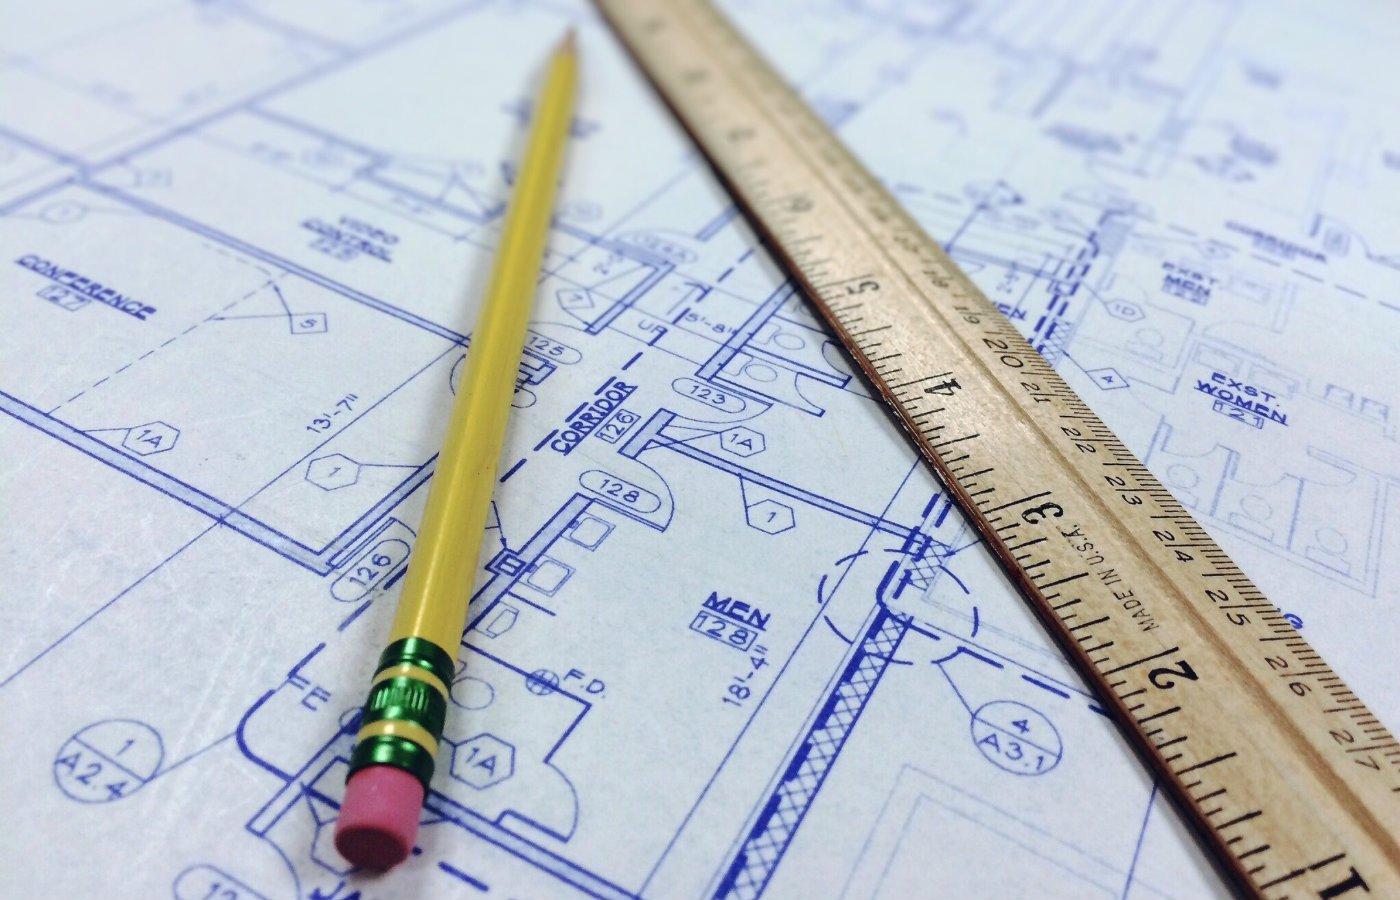 Making planning permission application.jpg